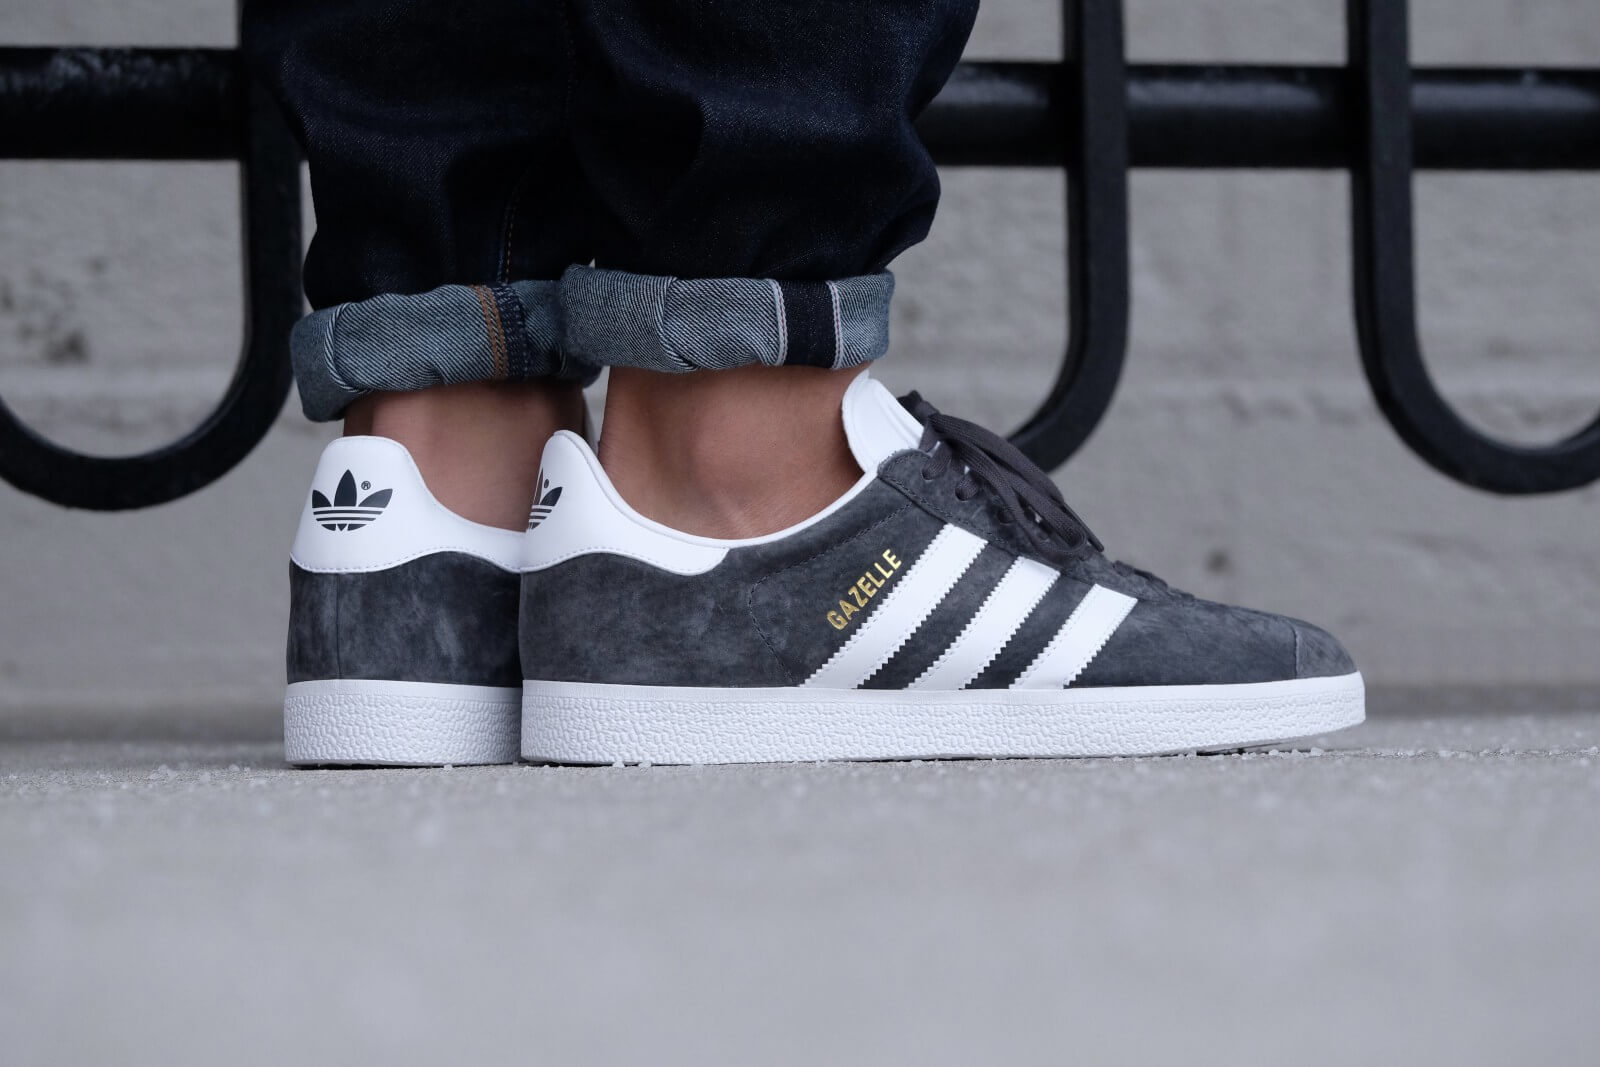 Adidas Gazelle Mens Shoes Solid Grey